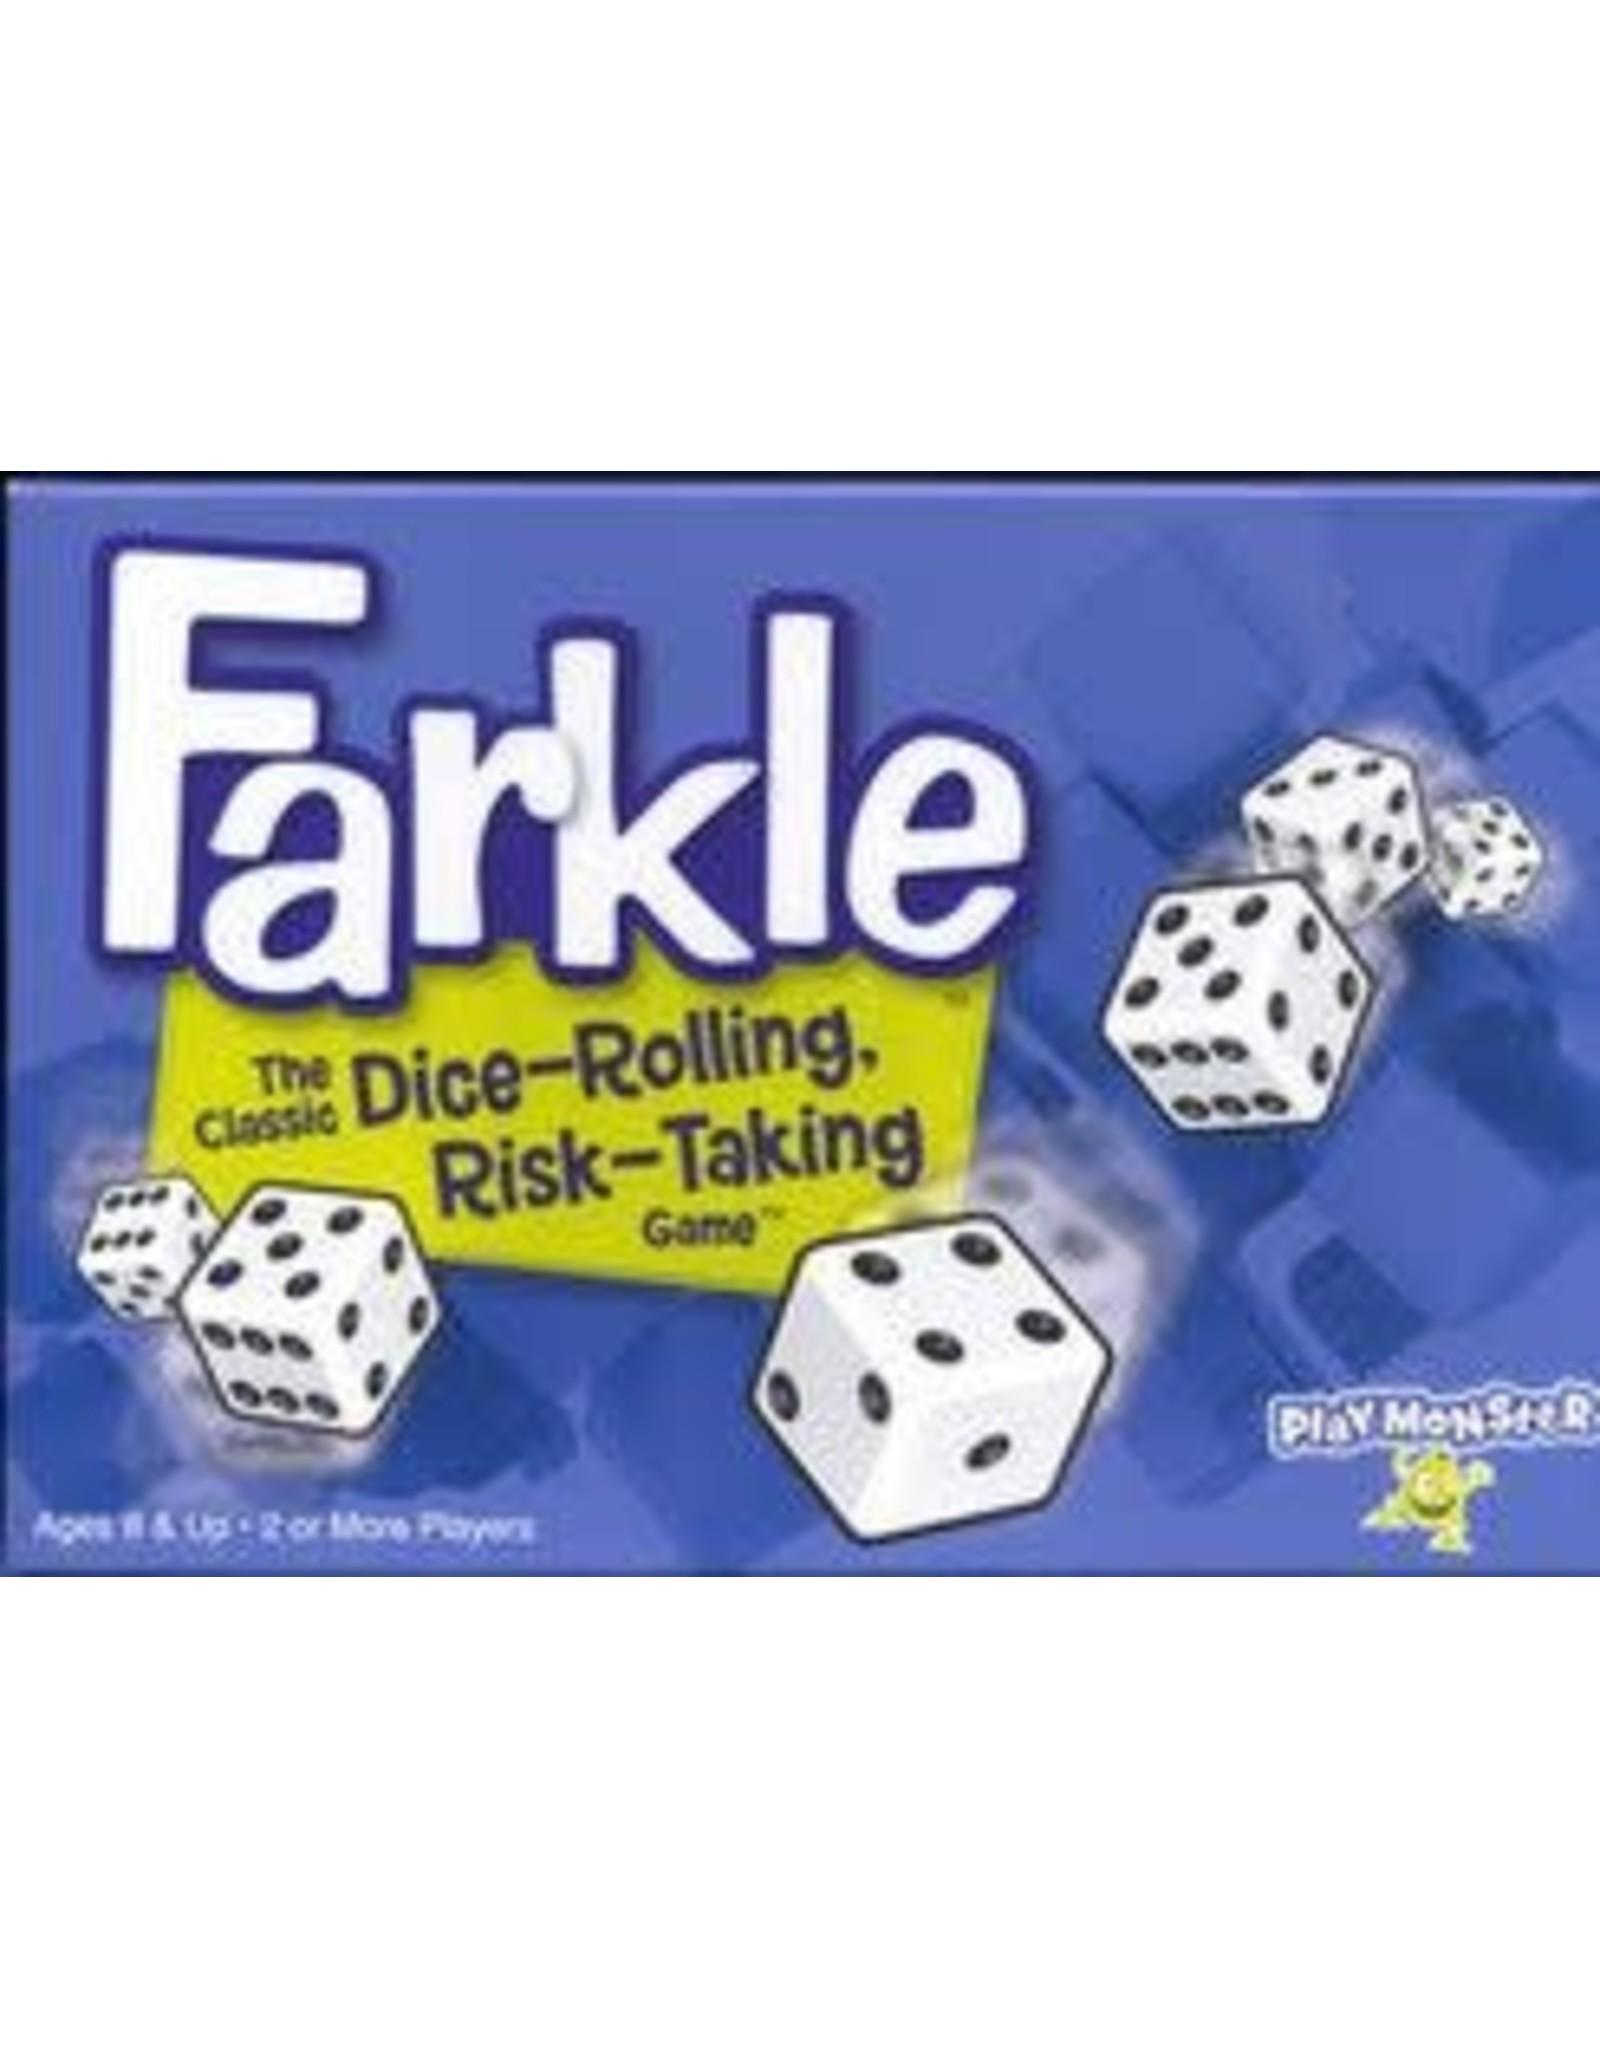 Farkle Box